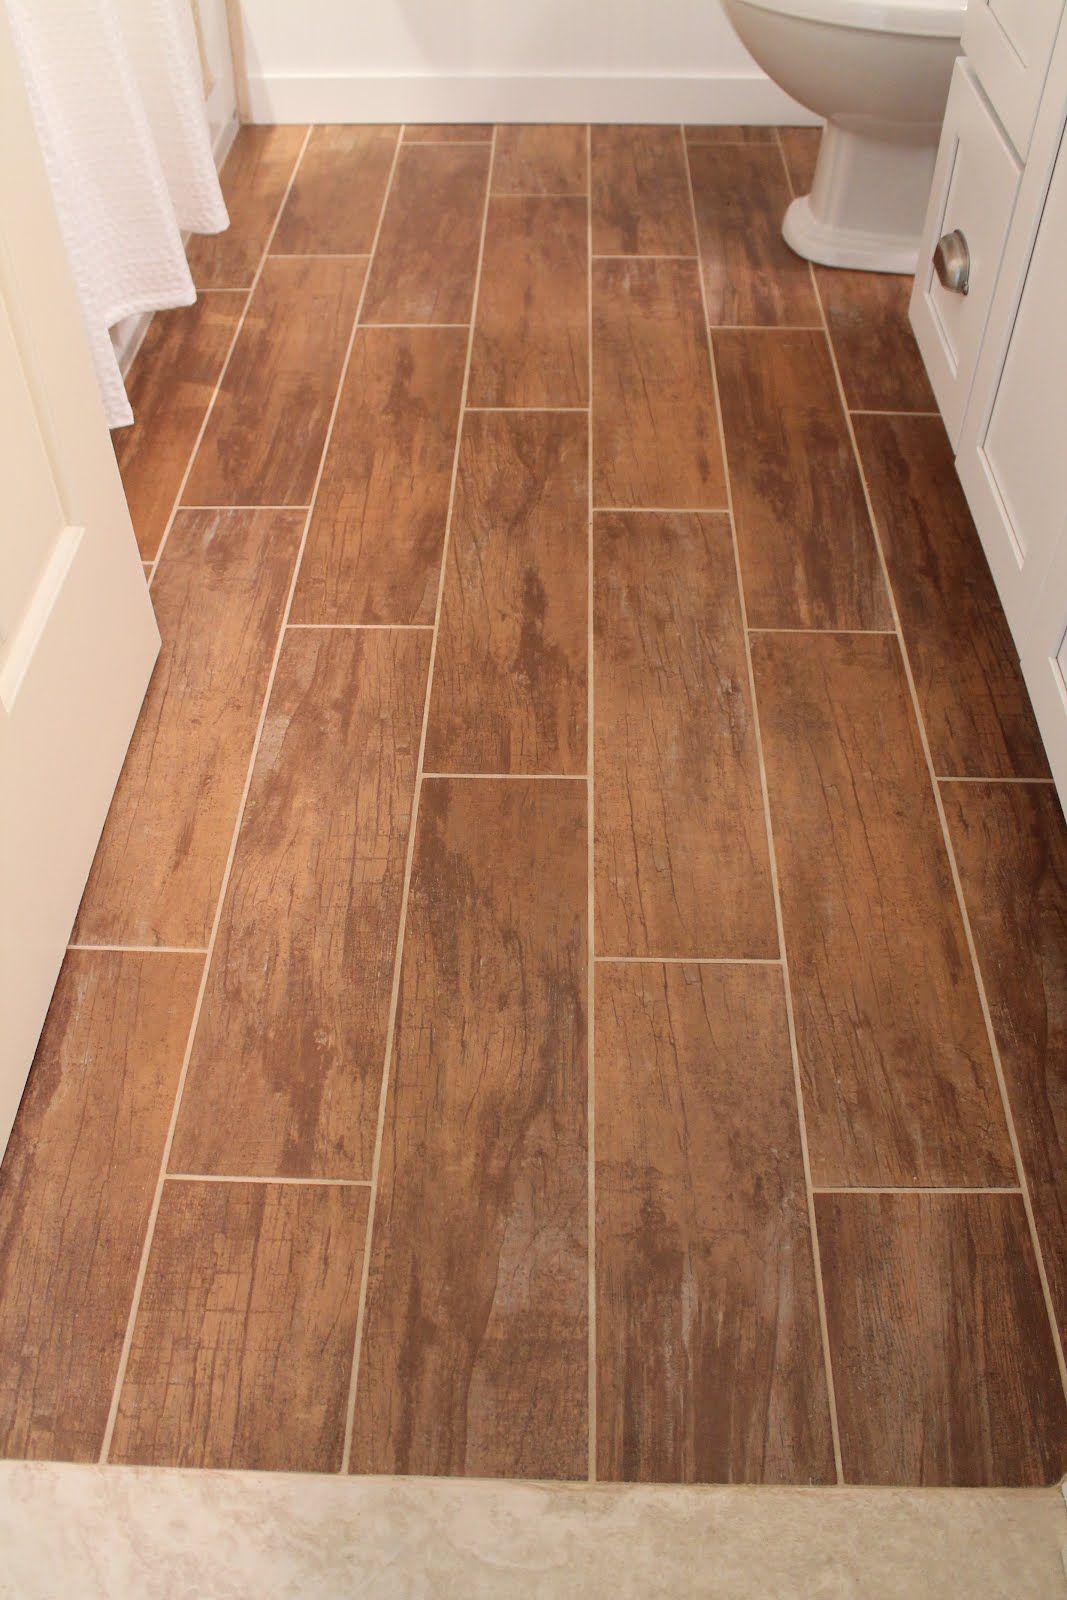 Floor color remodelaholic bathroom renovation with wood grain floor color remodelaholic bathroom renovation with wood grain tile and more dailygadgetfo Gallery